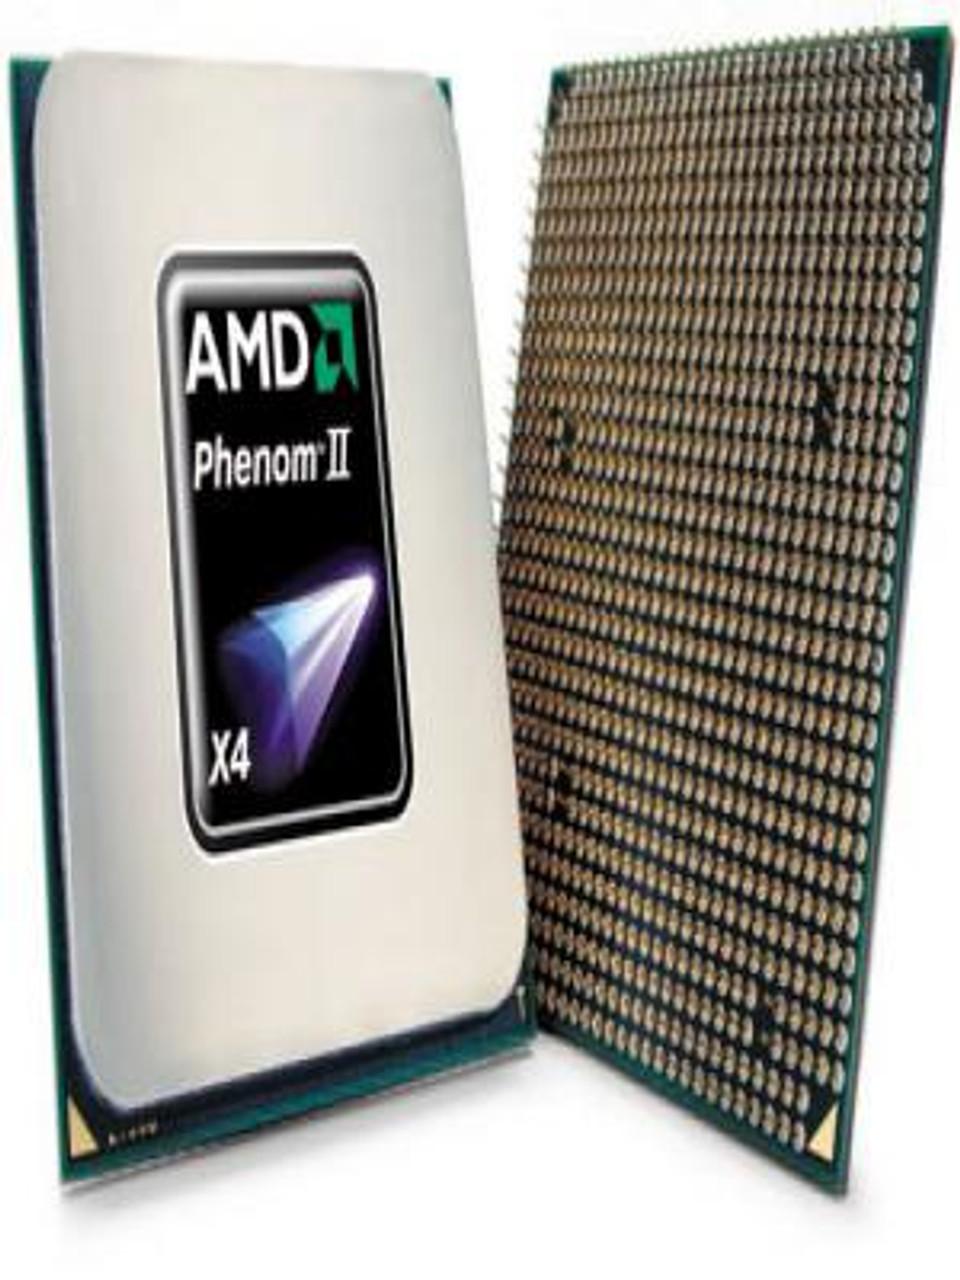 AMD Phenom II X4 820 2.80GHz 667GHz Desktop OEM CPU HDX820WFK4FGI